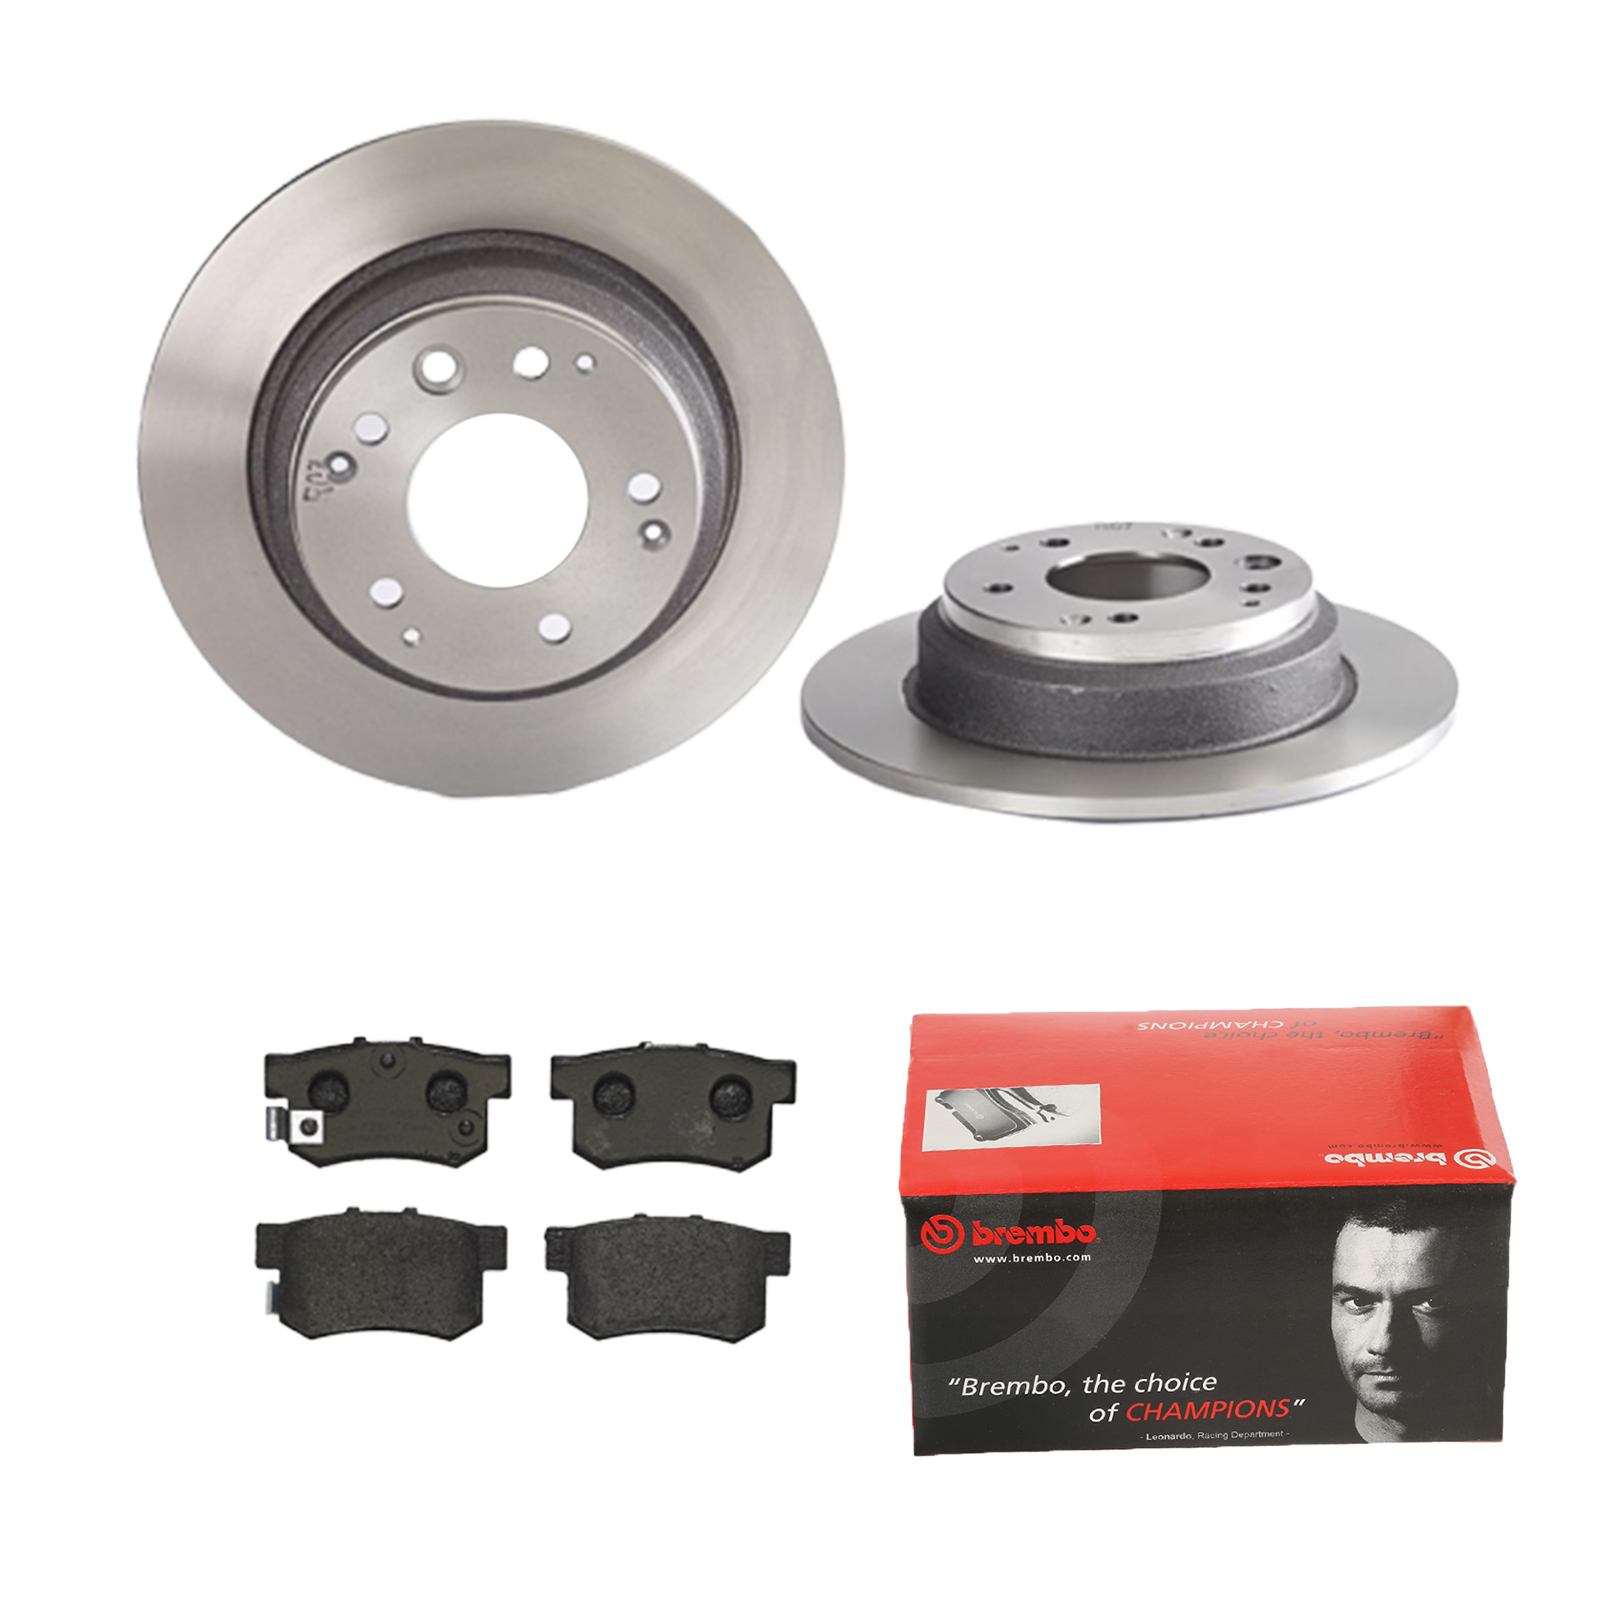 2 discos de freno Full 282 mm ATE ATE Almohadillas de freno Almohadillas de freno traseras para VW Juego de frenos SEAT,